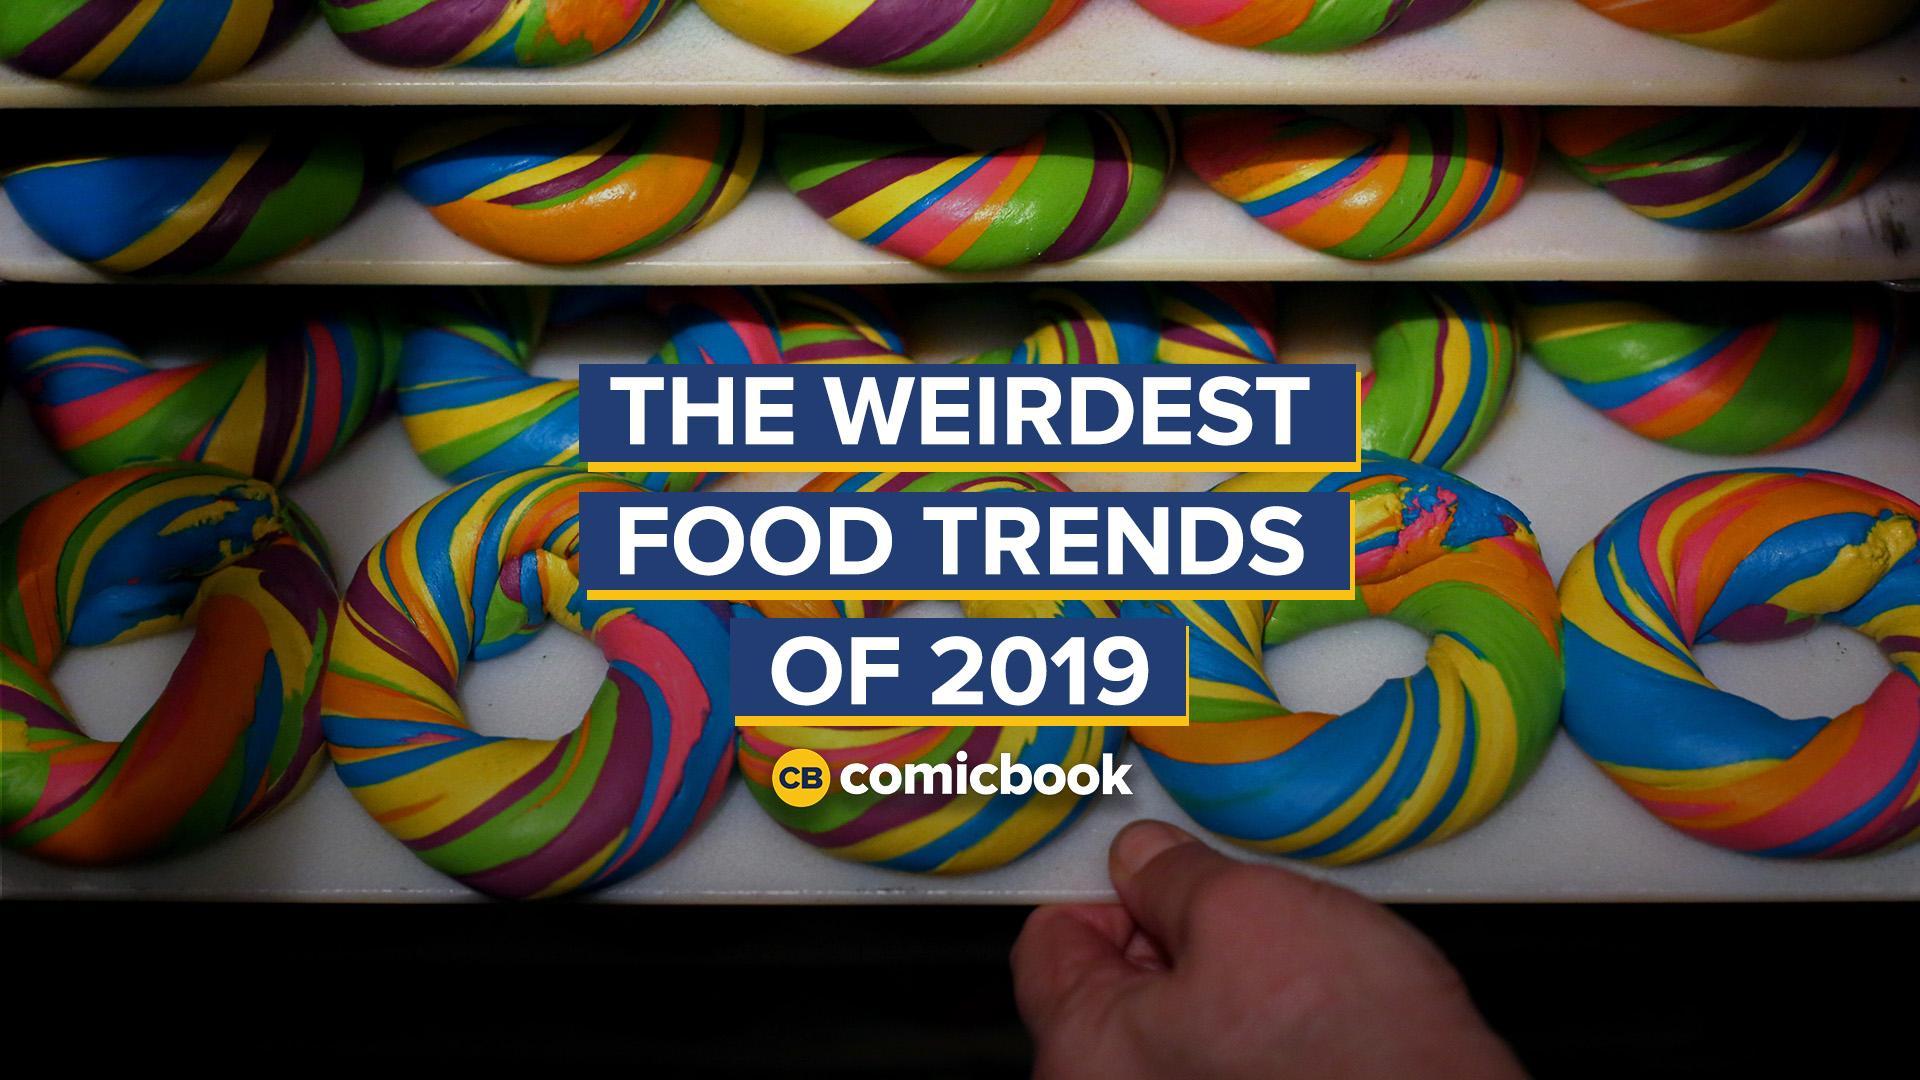 The Weirdest Food Trends of 2019 screen capture